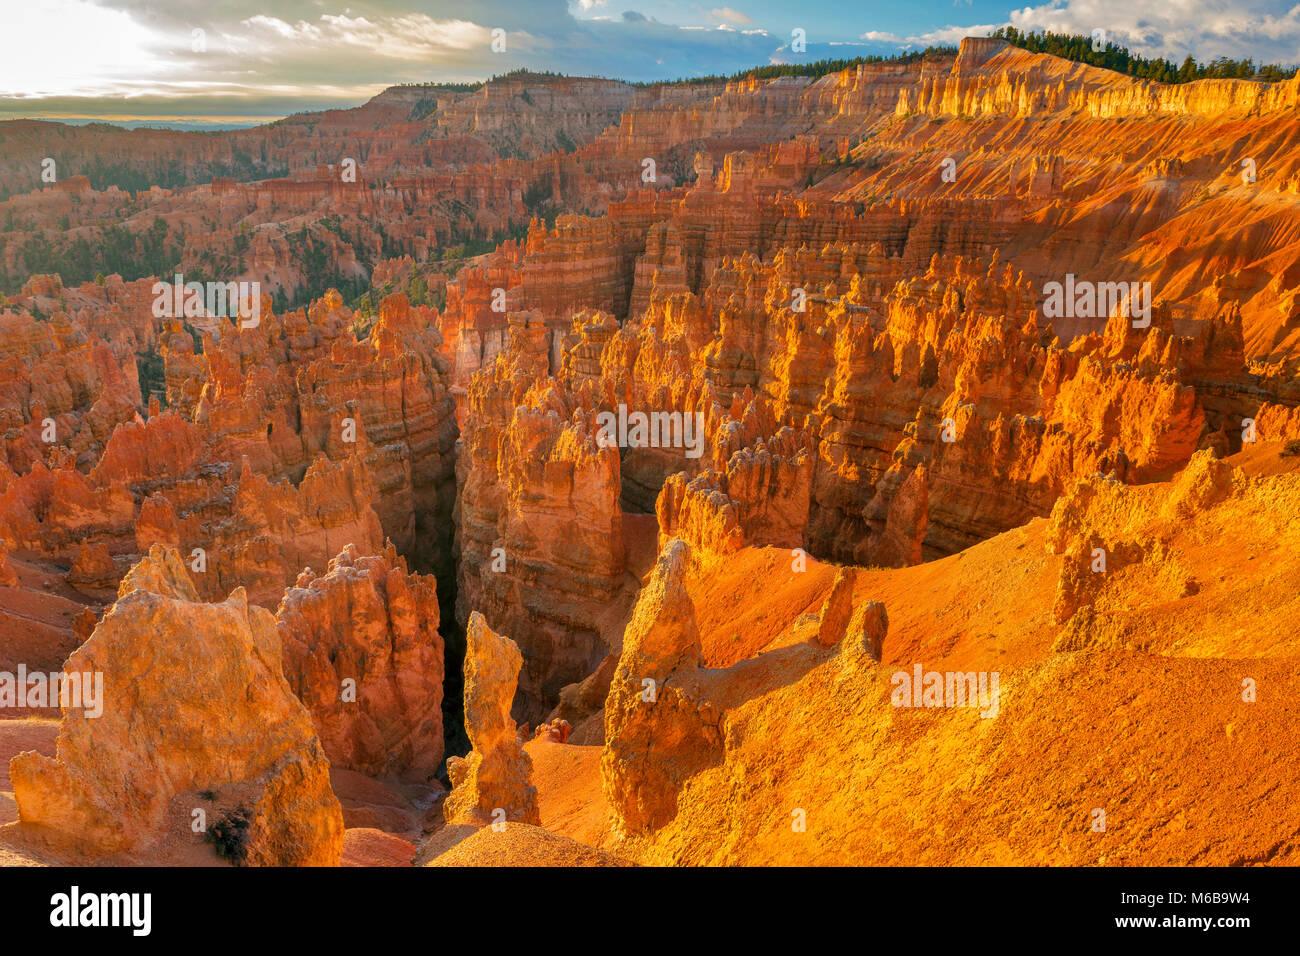 Sunrise, Hoodoos, die Wall Street, Bryce Canyon National Park, Utah Stockbild